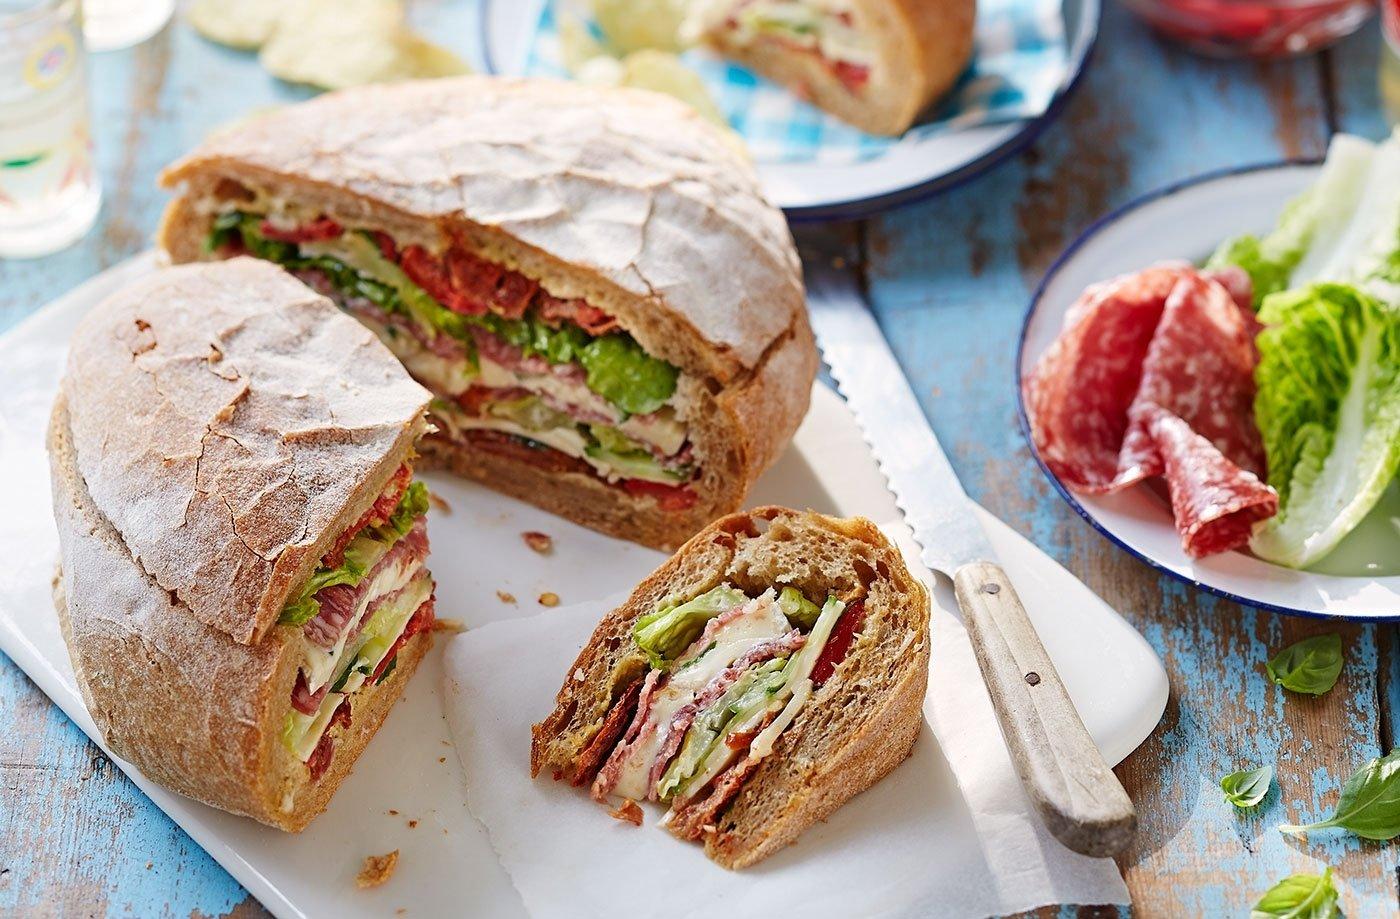 10 Perfect Food Ideas For A Picnic picnic loaf picnic ideas tesco real food 2020